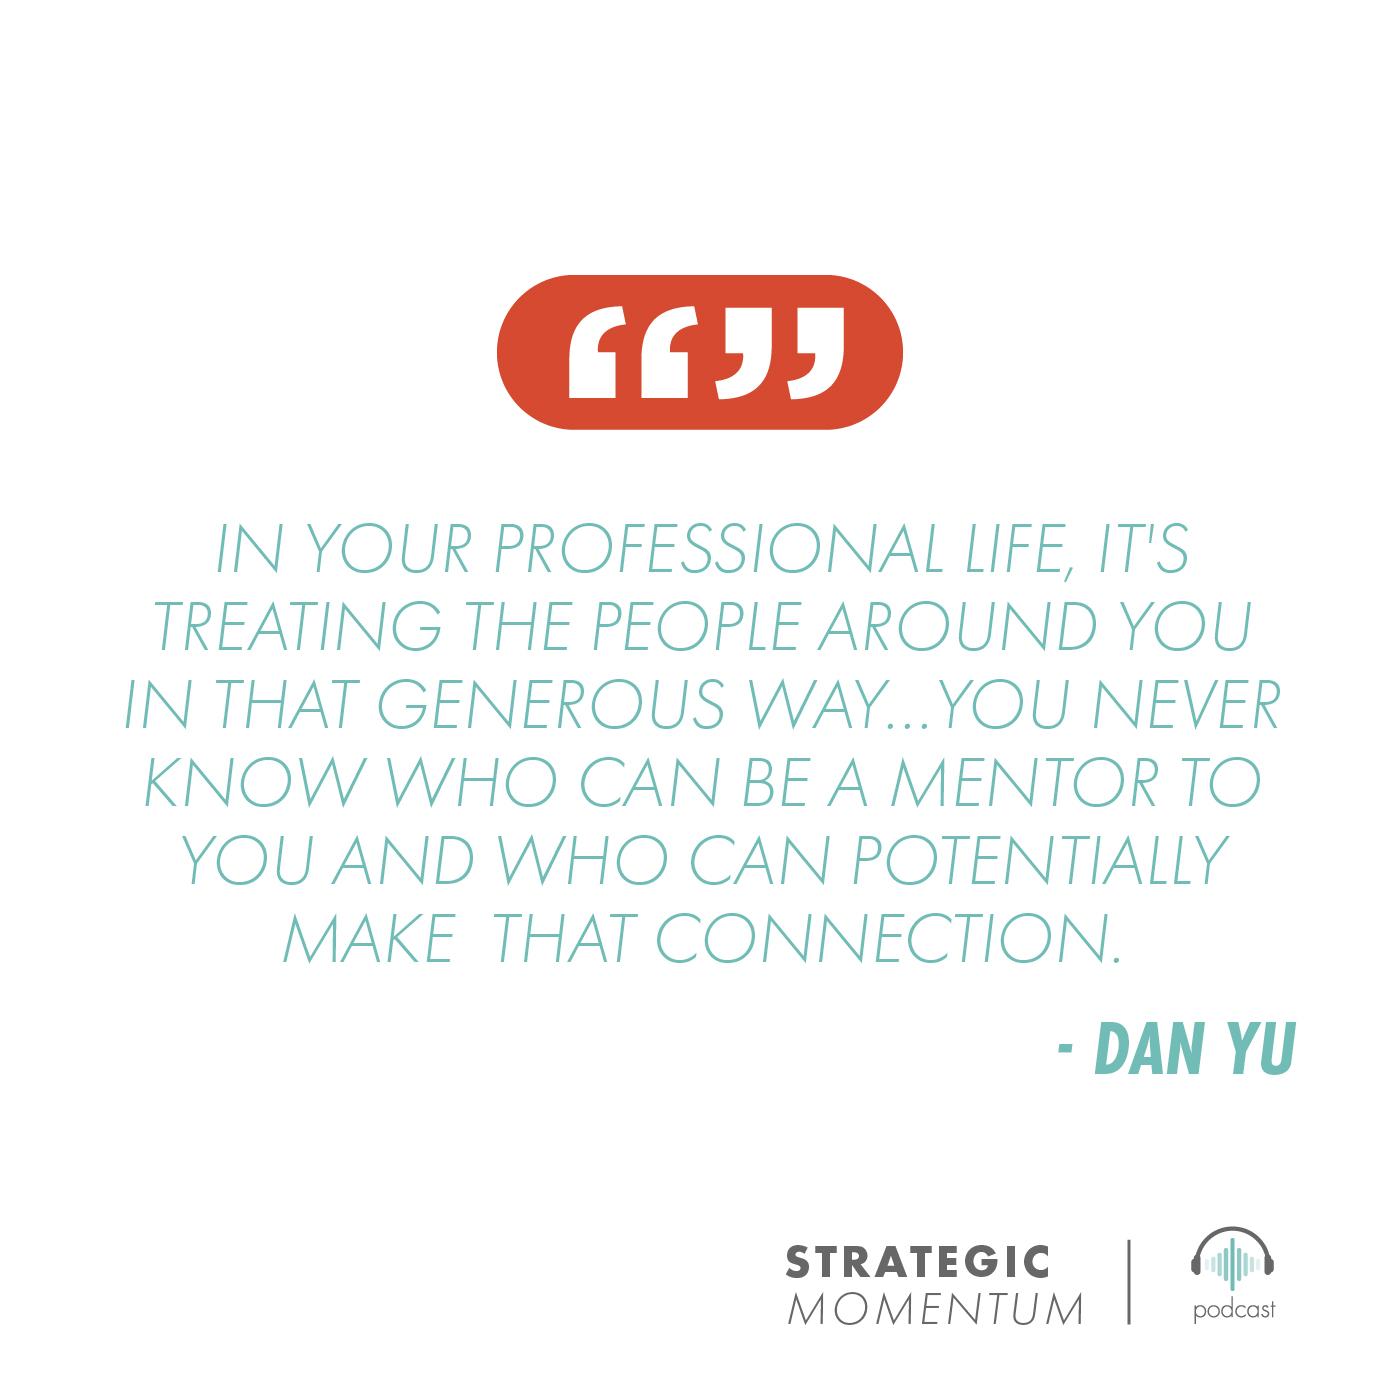 Dan Yu Quote | Strategic Momentum Podcast